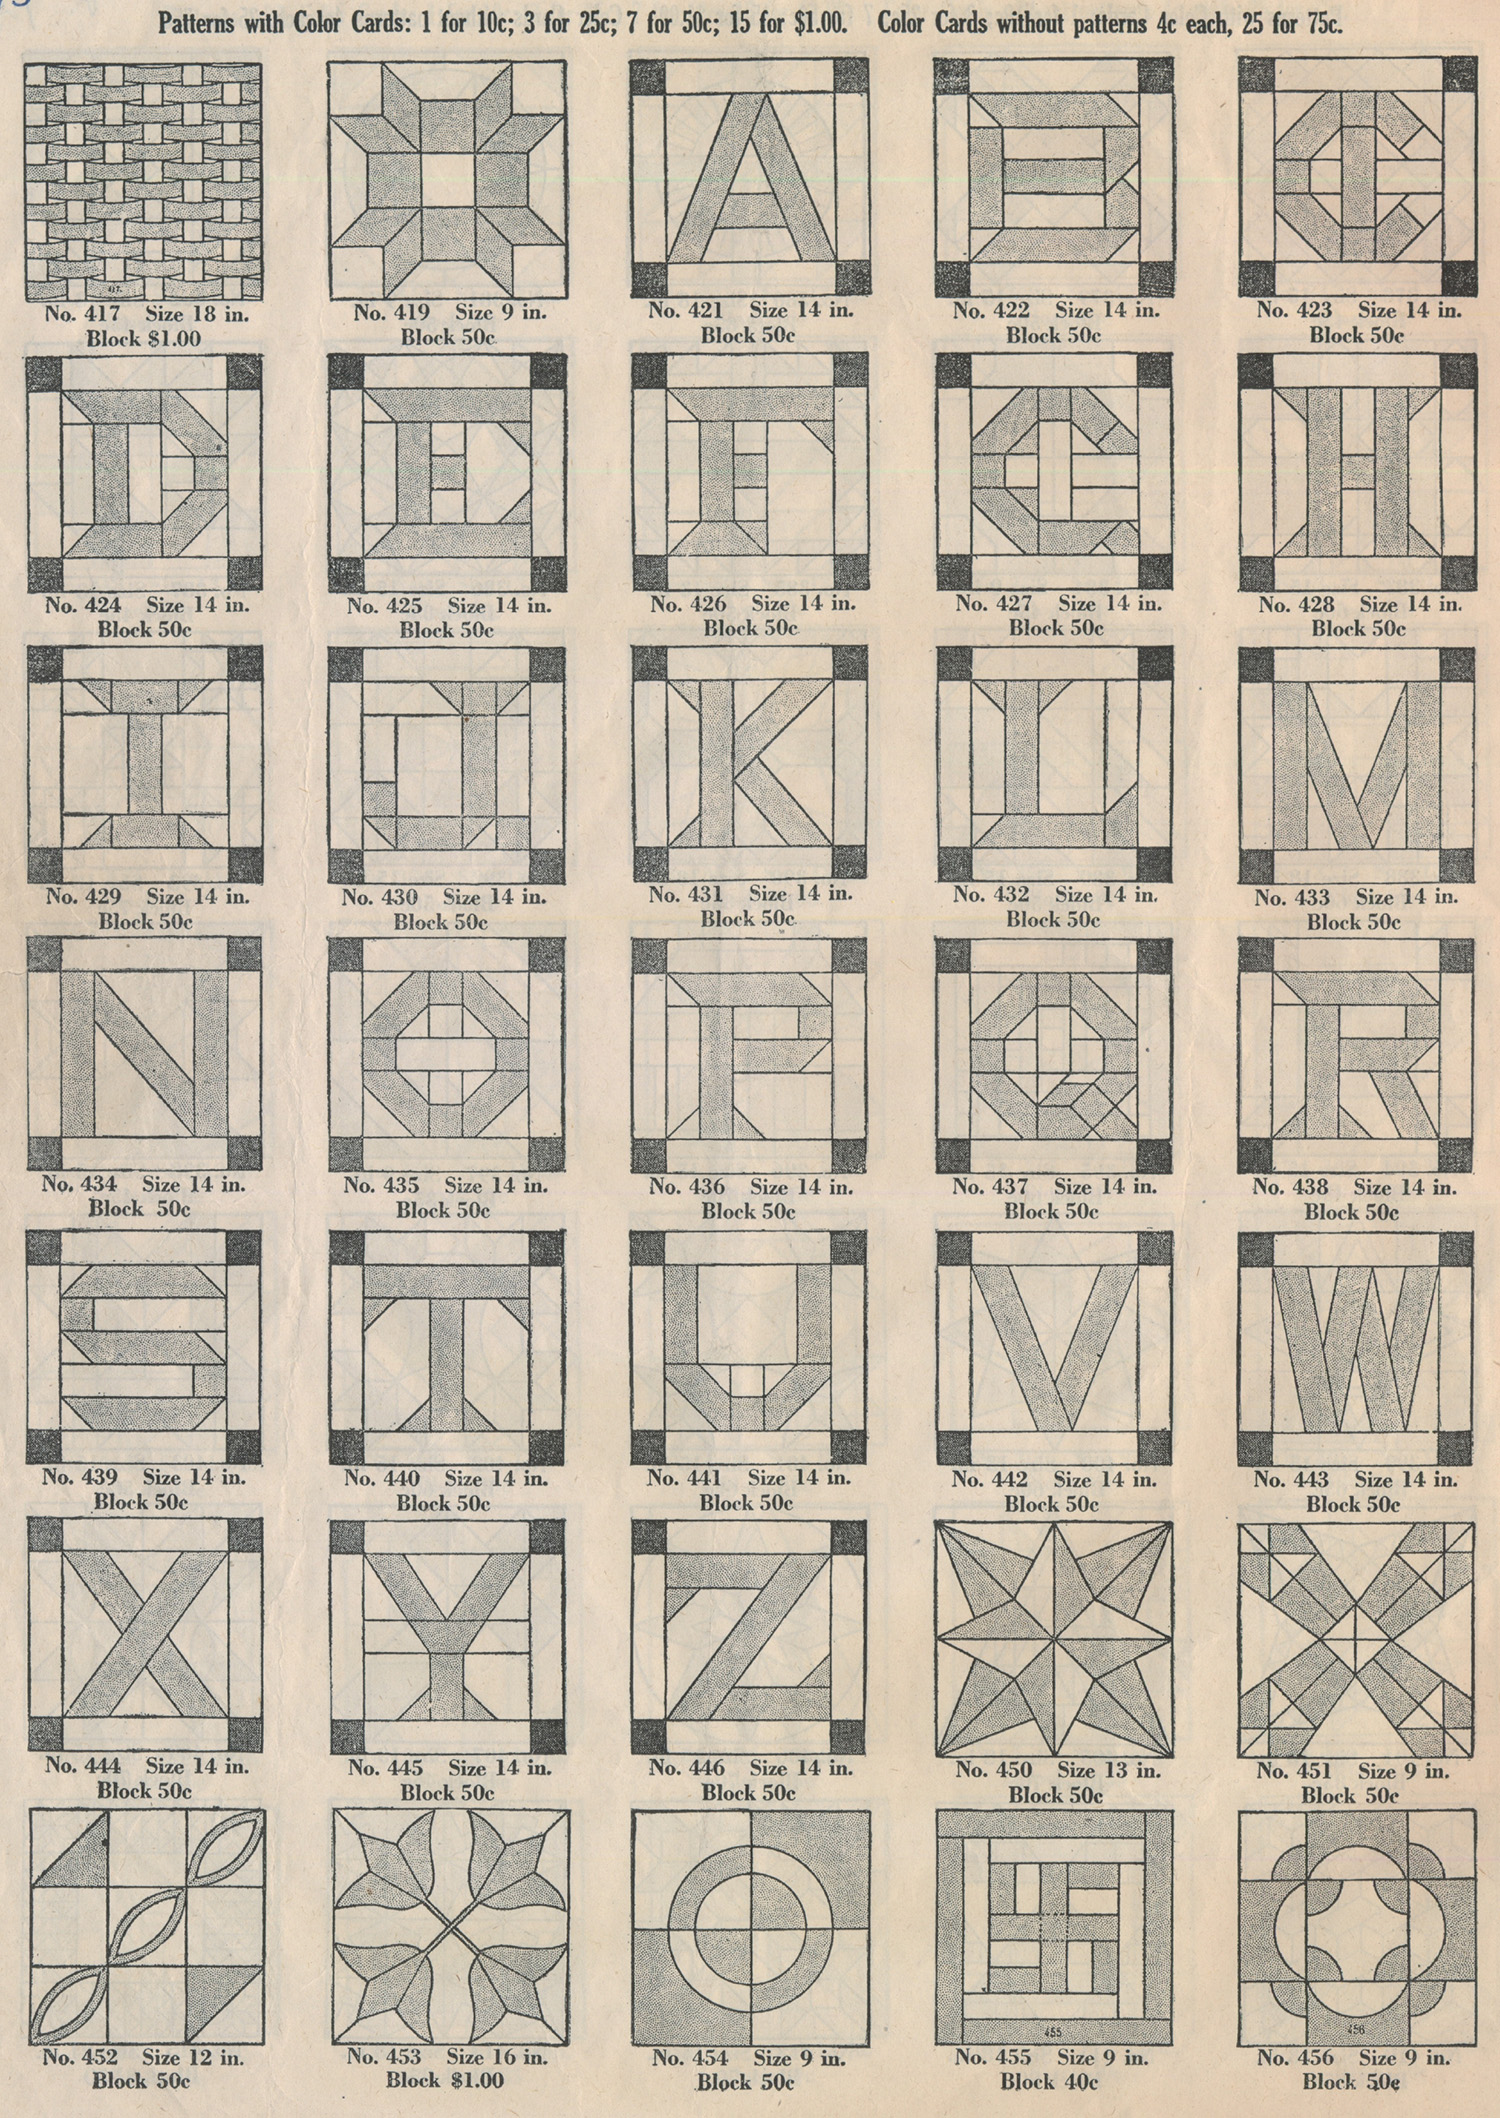 Ladies Art Company Alphabet Patterns World Quilts The